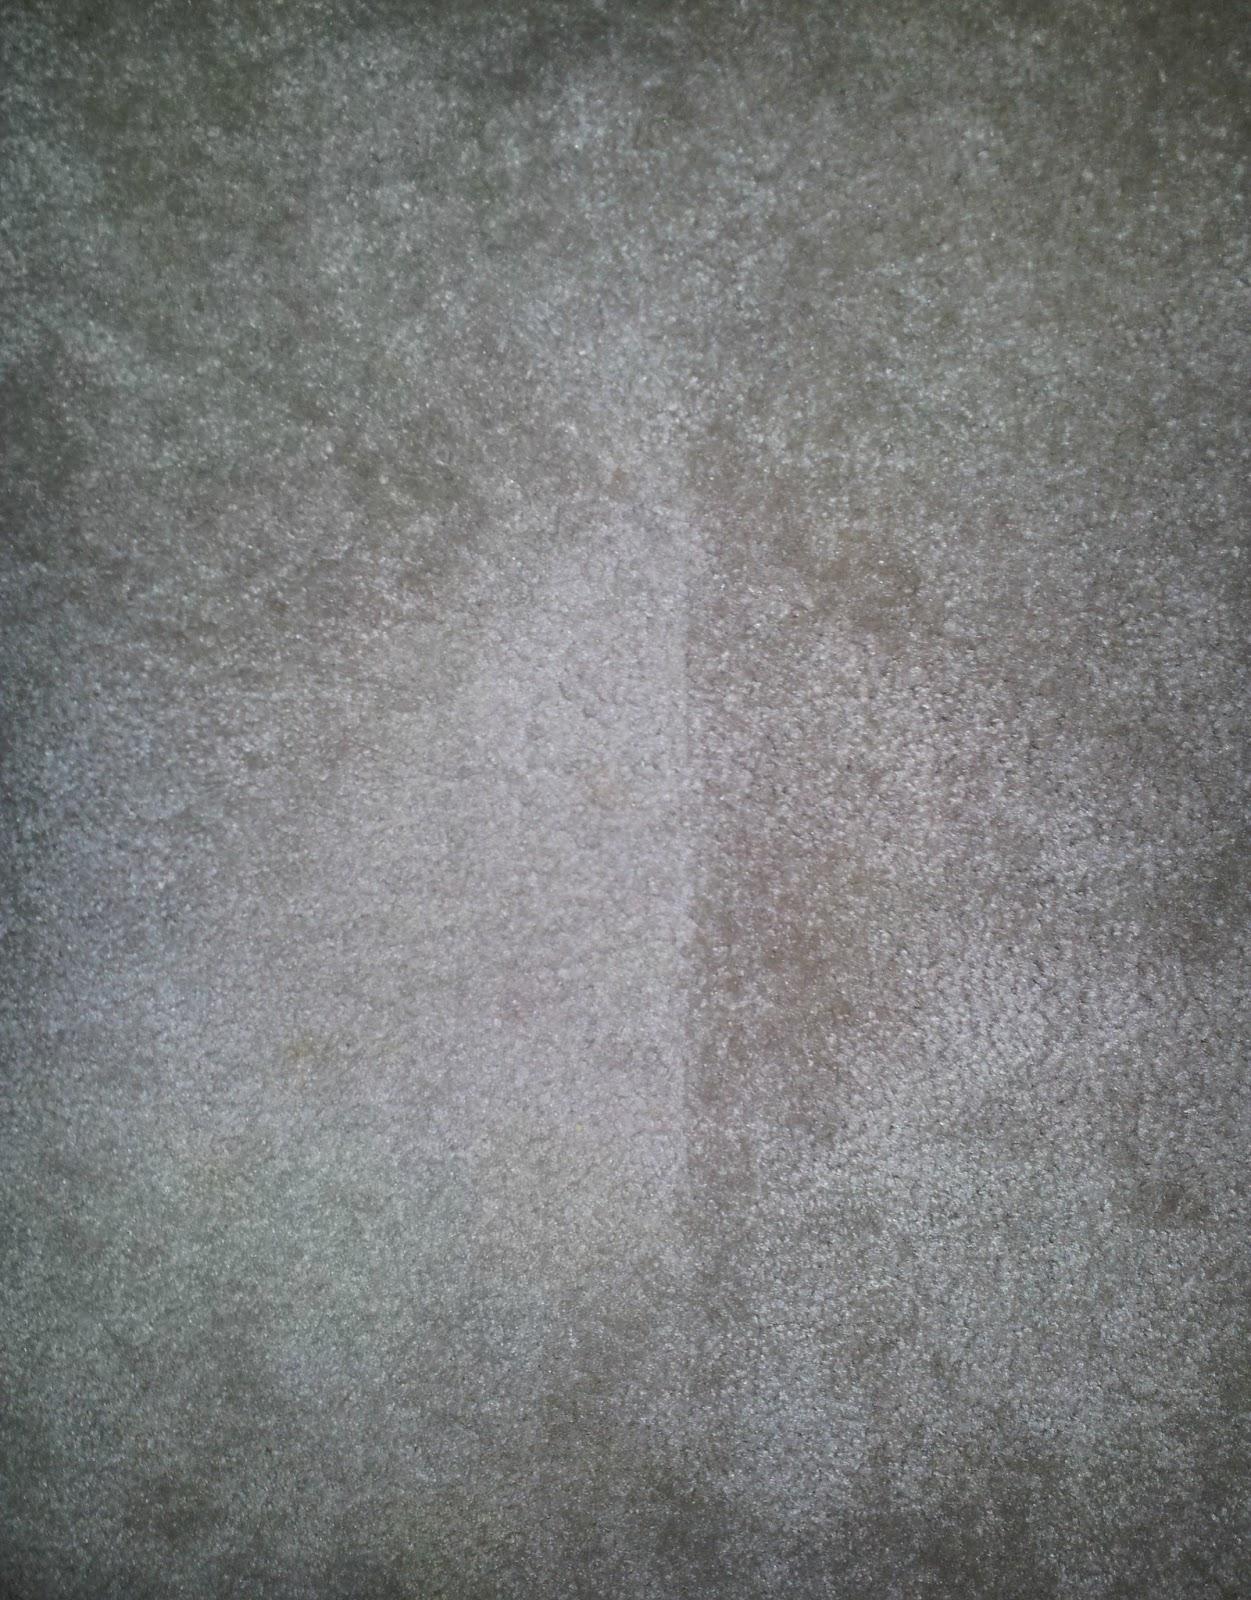 Rantin Amp Ravin Carpet Cleaning